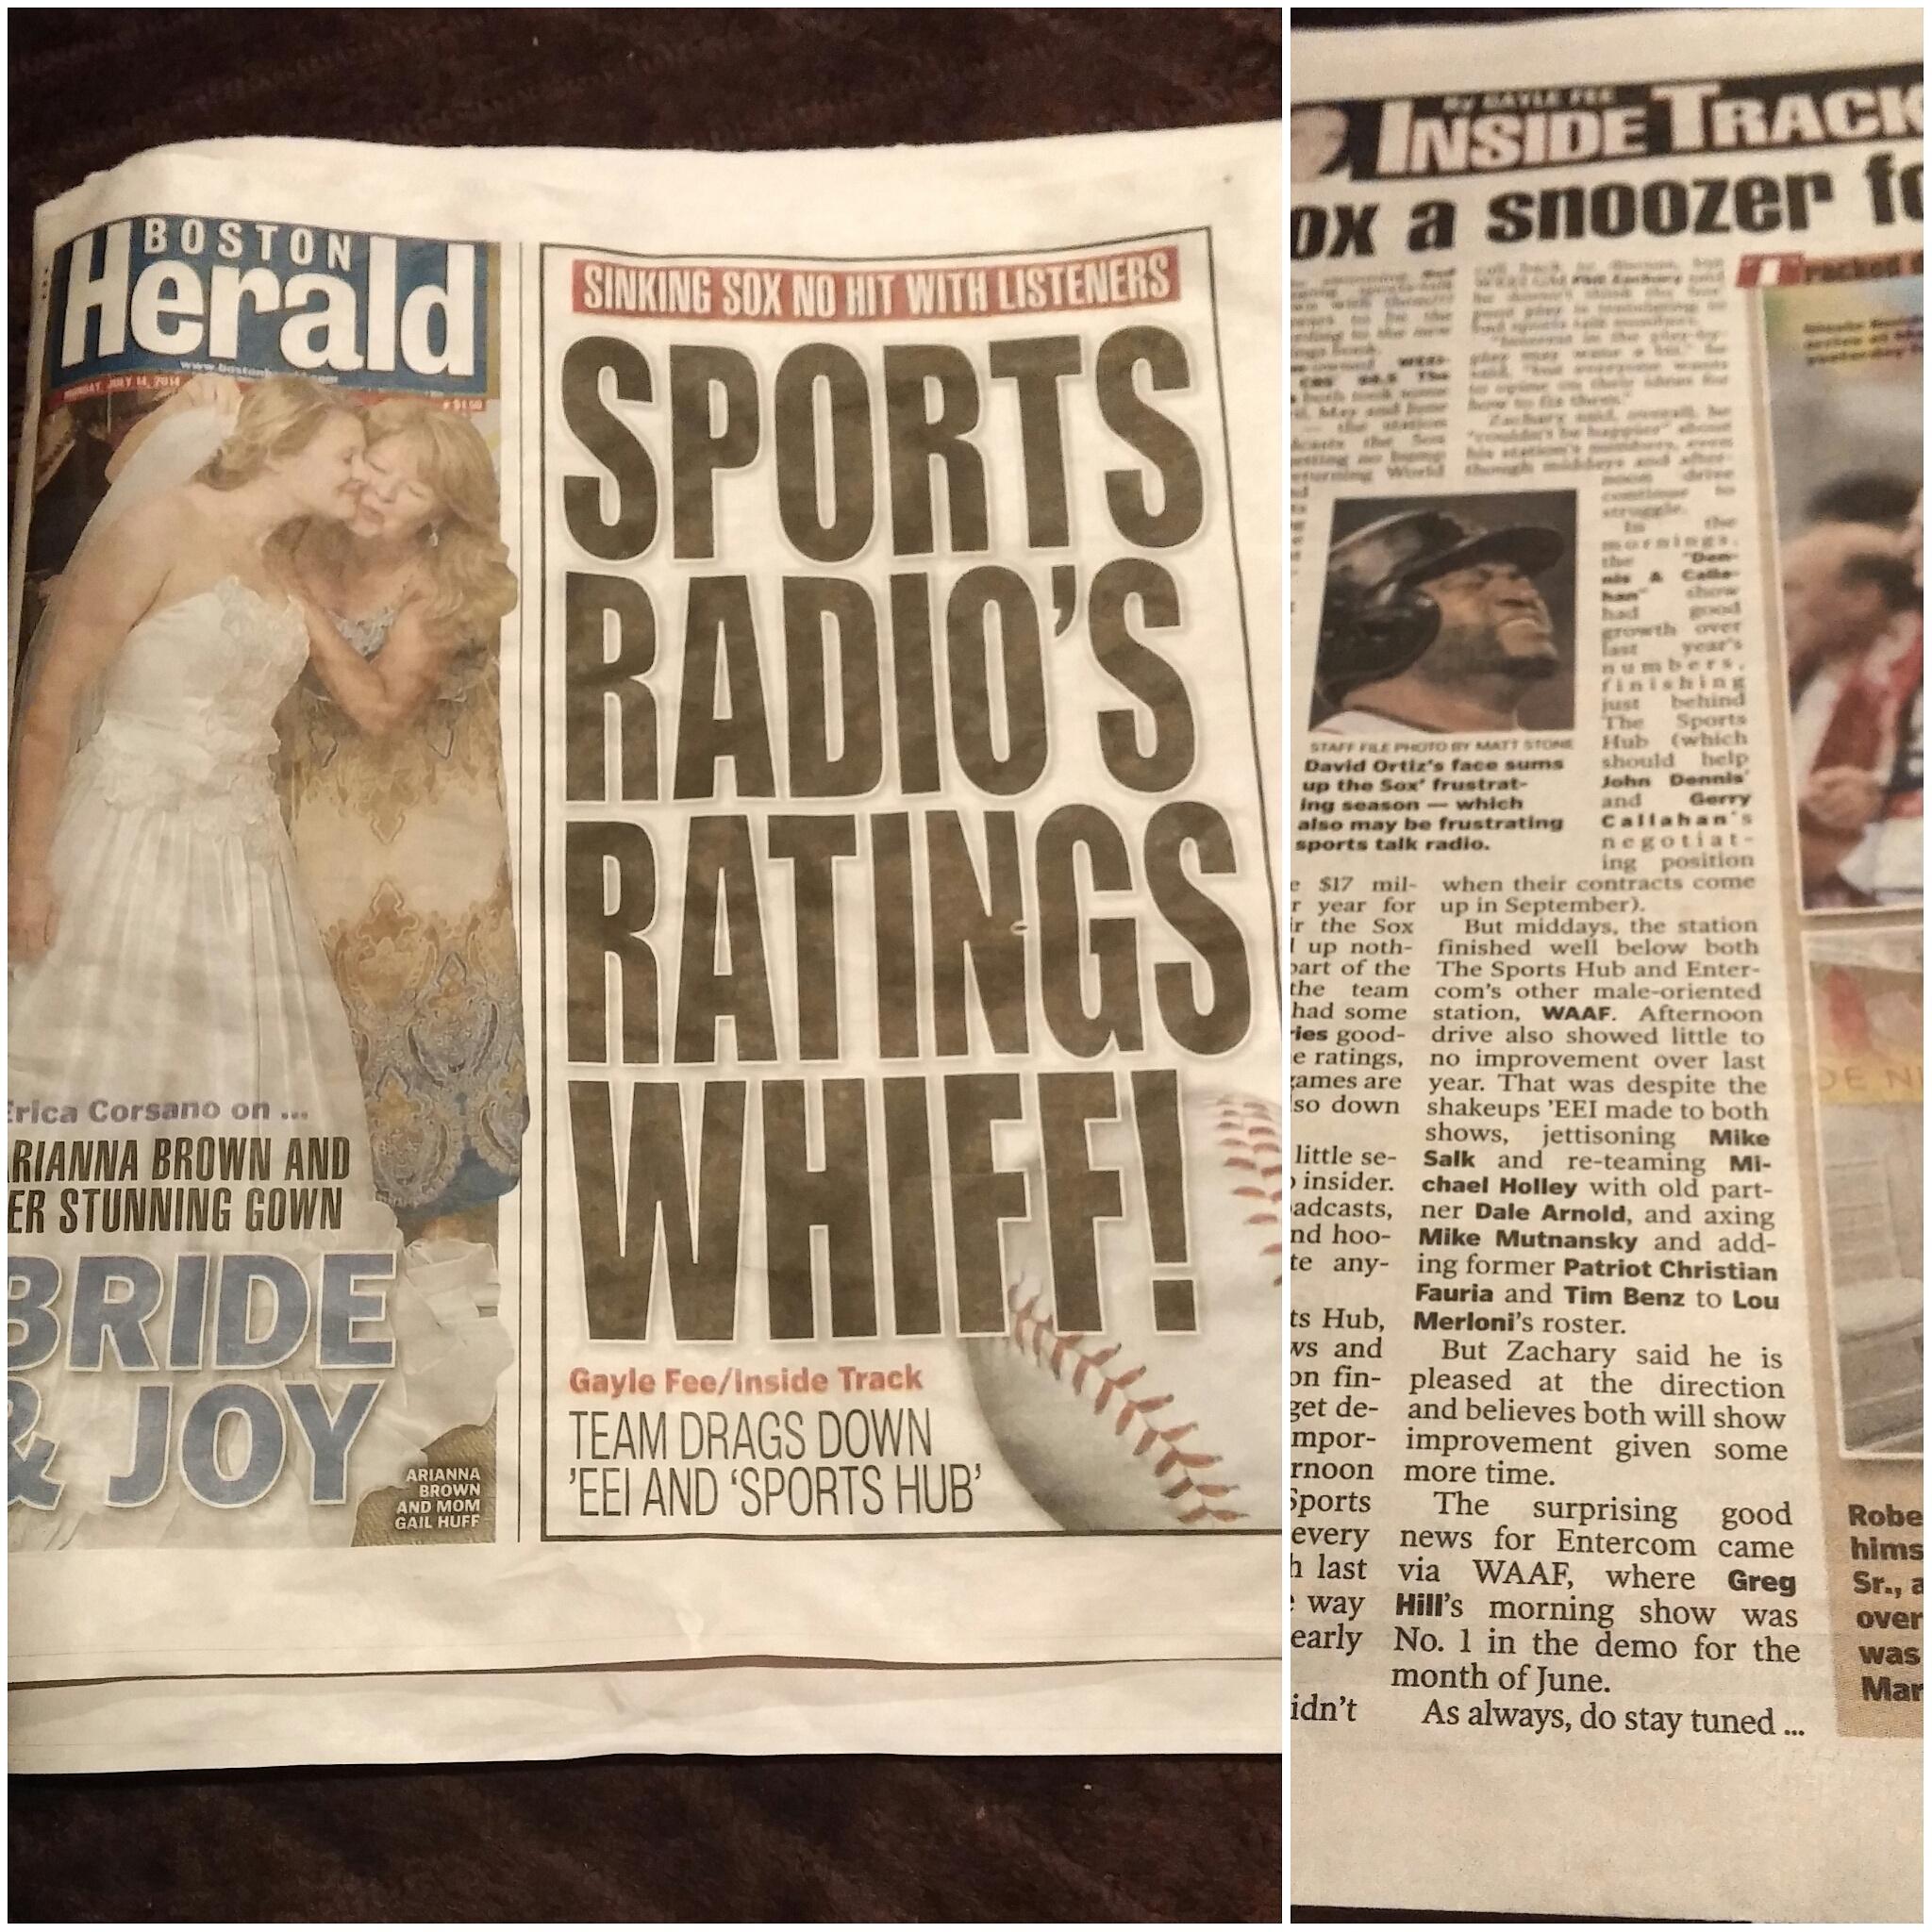 Ratings in Herald.JPG